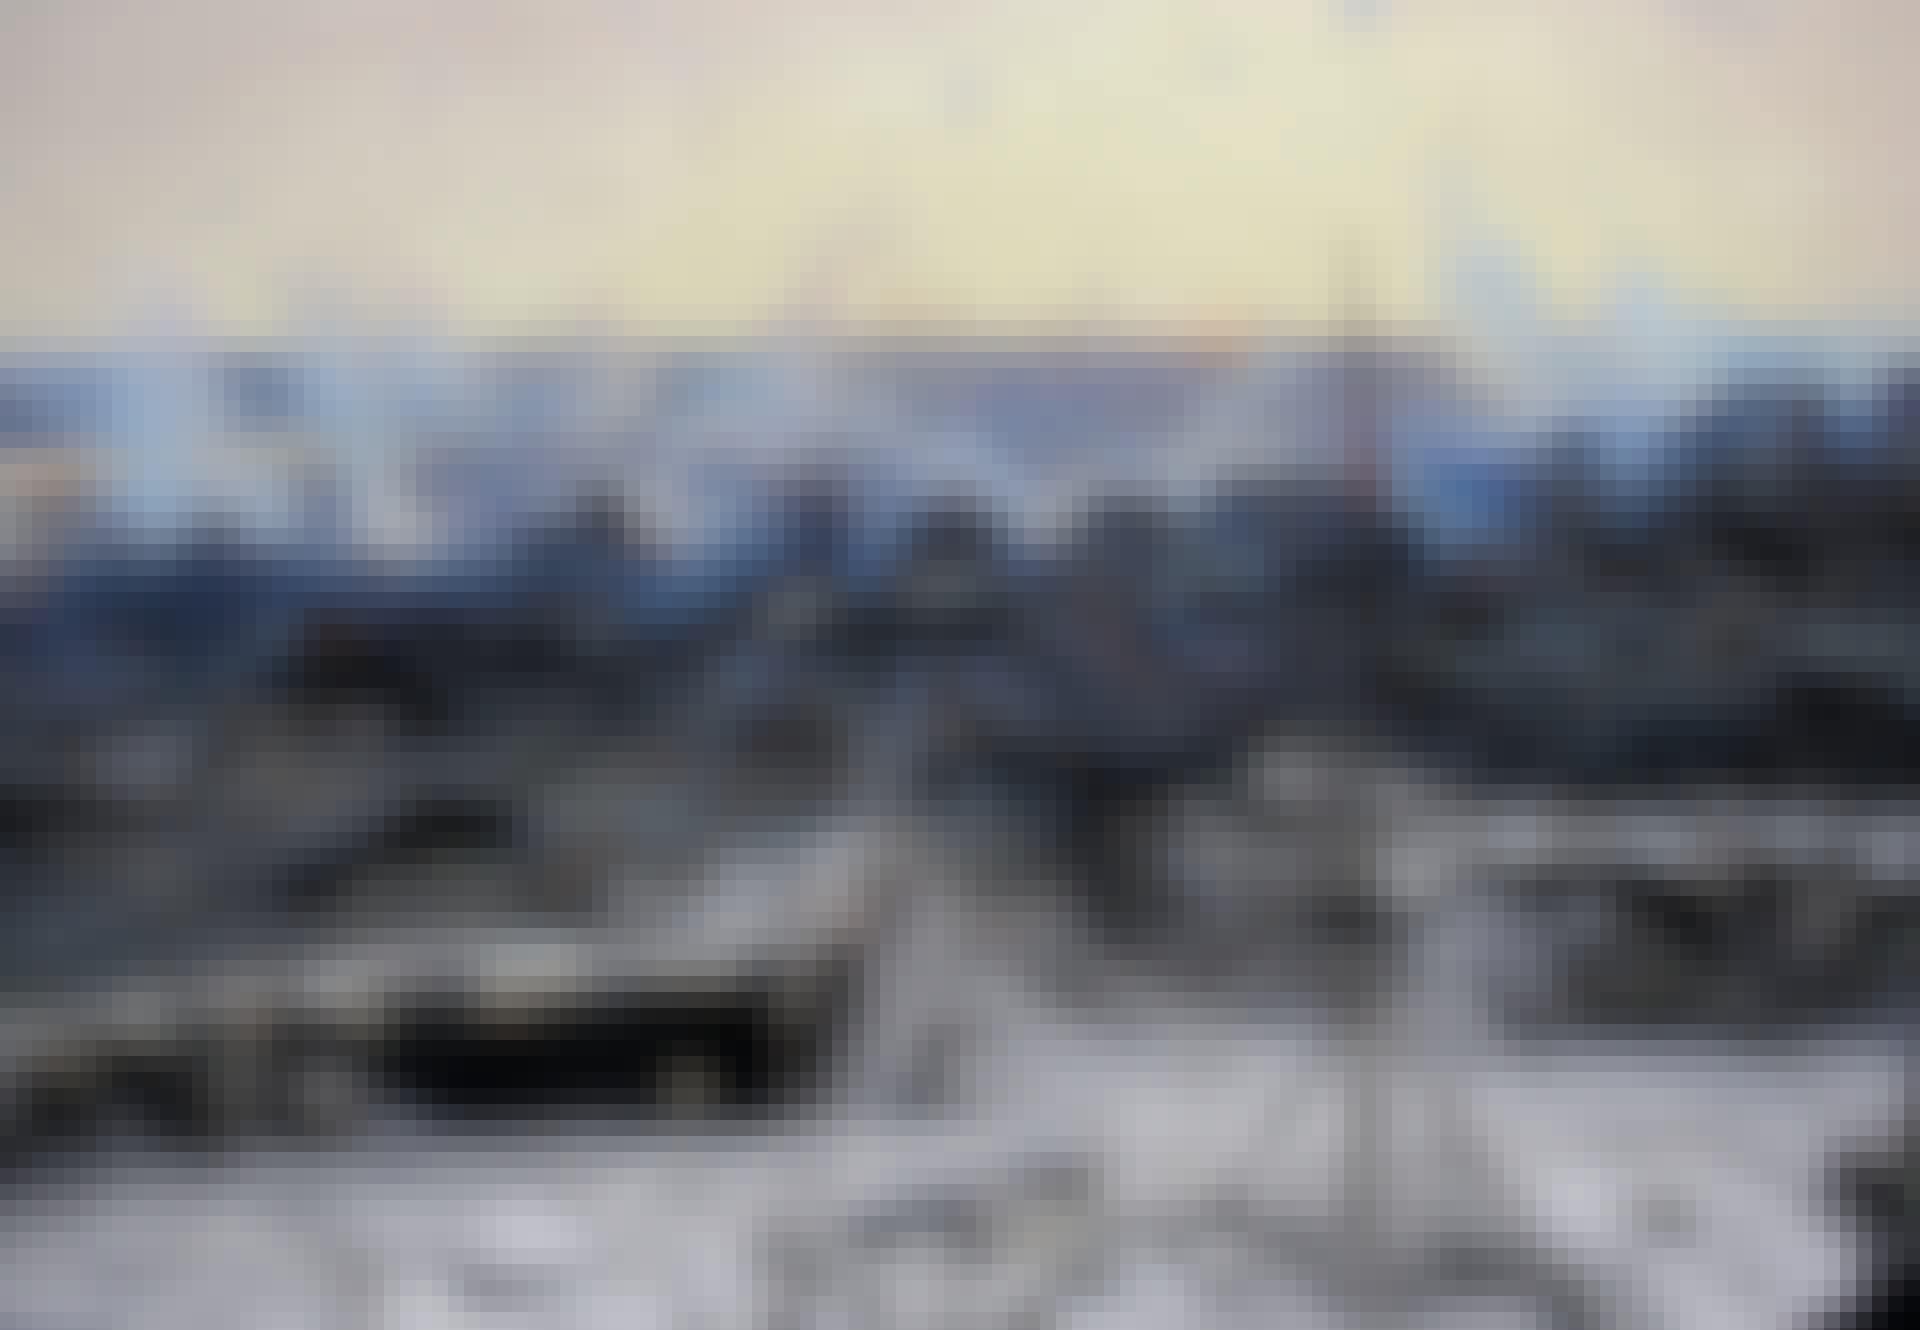 Crimean War (1853-1856). Siege of Sevastopol, 1854-1855, by Franz Alekseyevich Roubaud (1856-1928). Crimean Peninsula. Ukraine.